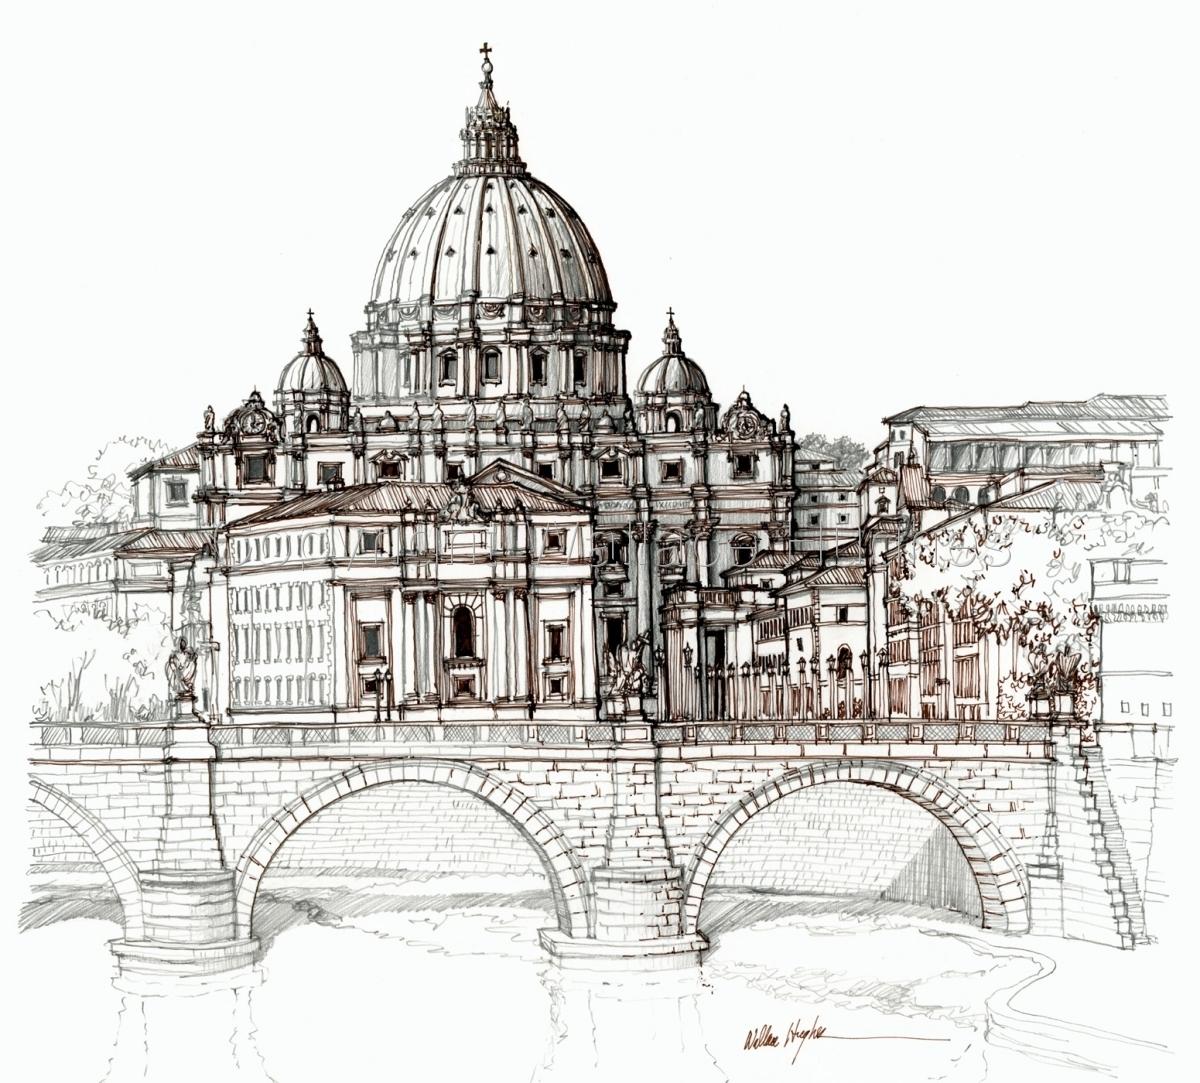 Viva Roma (large view)